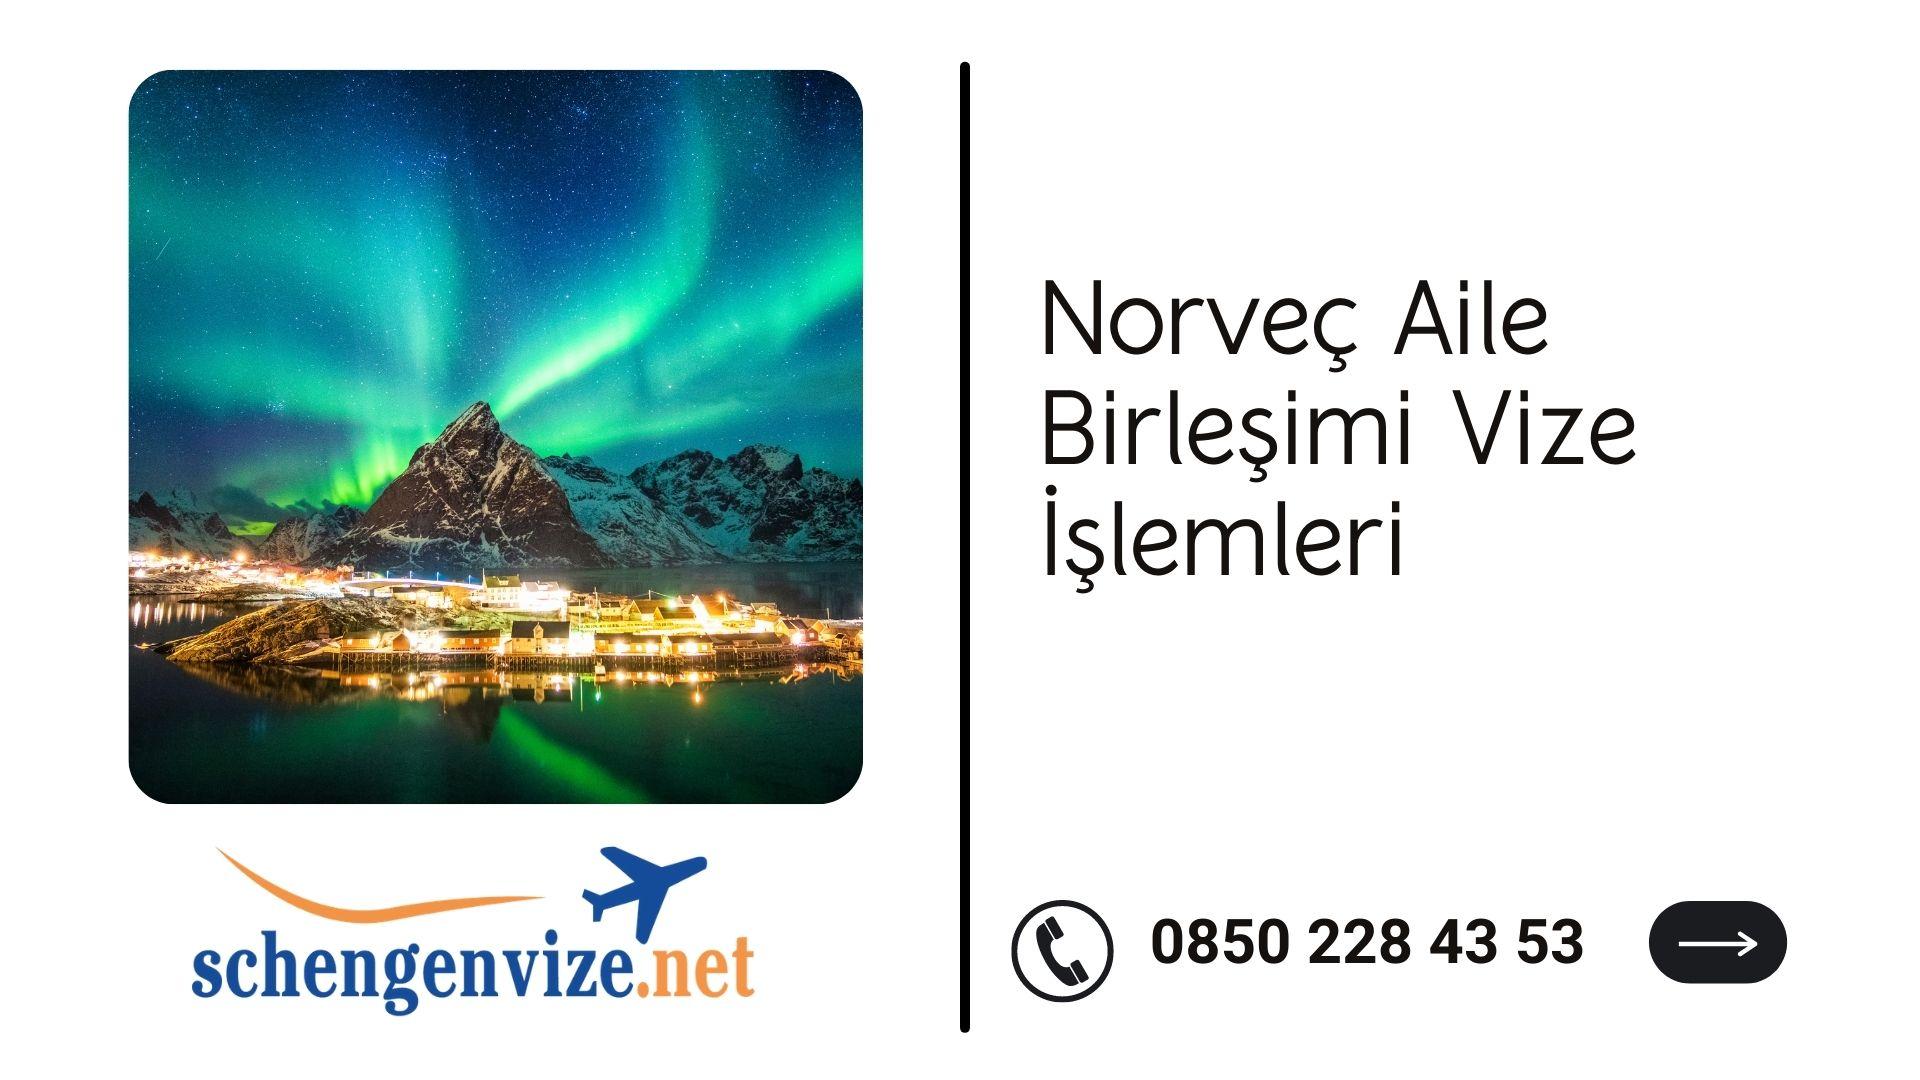 Norveç Aile Birleşimi Vize İşlemleri